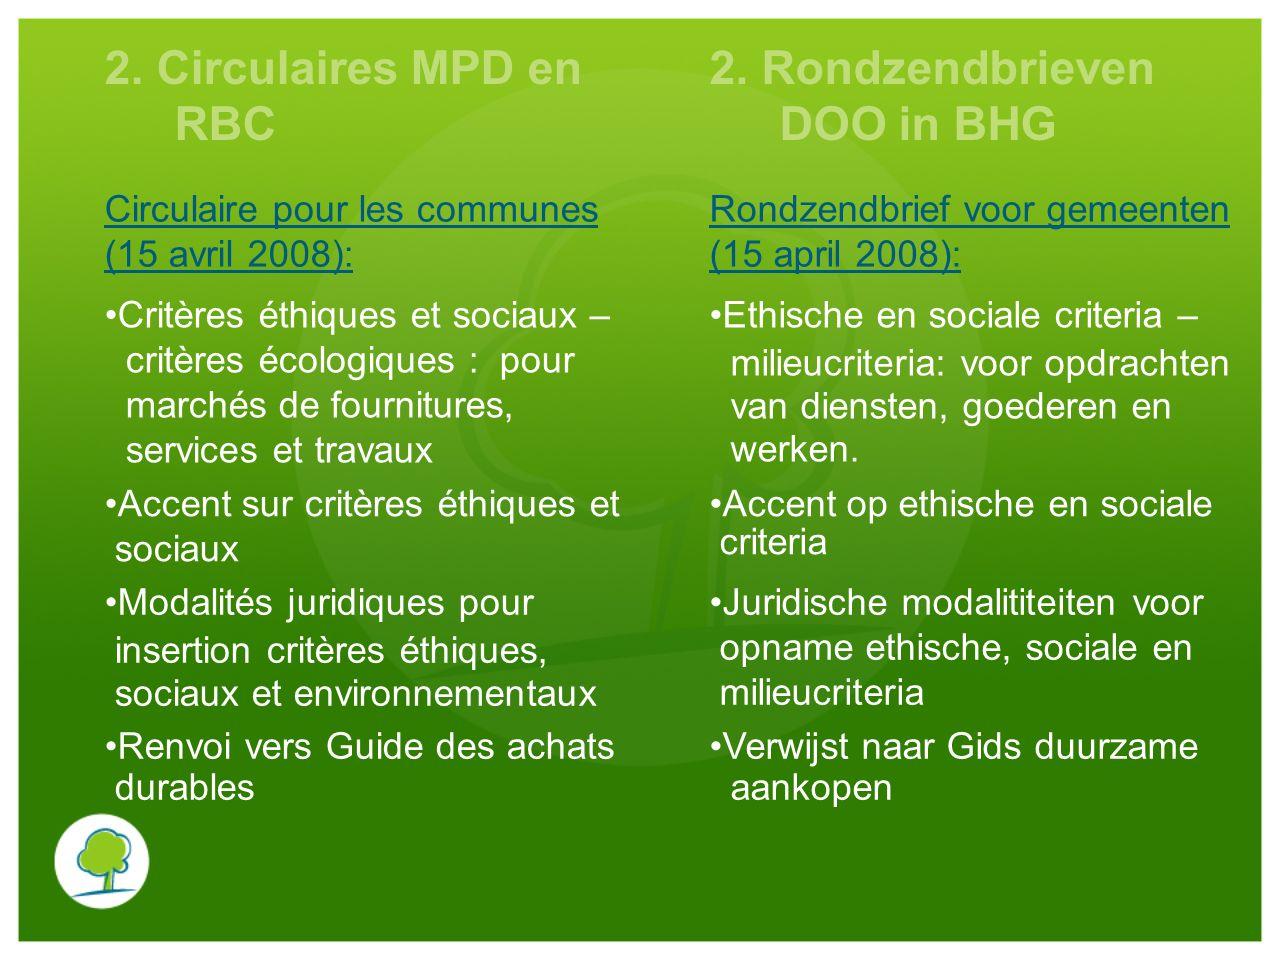 2. Circulaires MPD en RBC 2. Rondzendbrieven DOO in BHG Circulaire pour les communes (15 avril 2008): Rondzendbrief voor gemeenten (15 april 2008): Cr